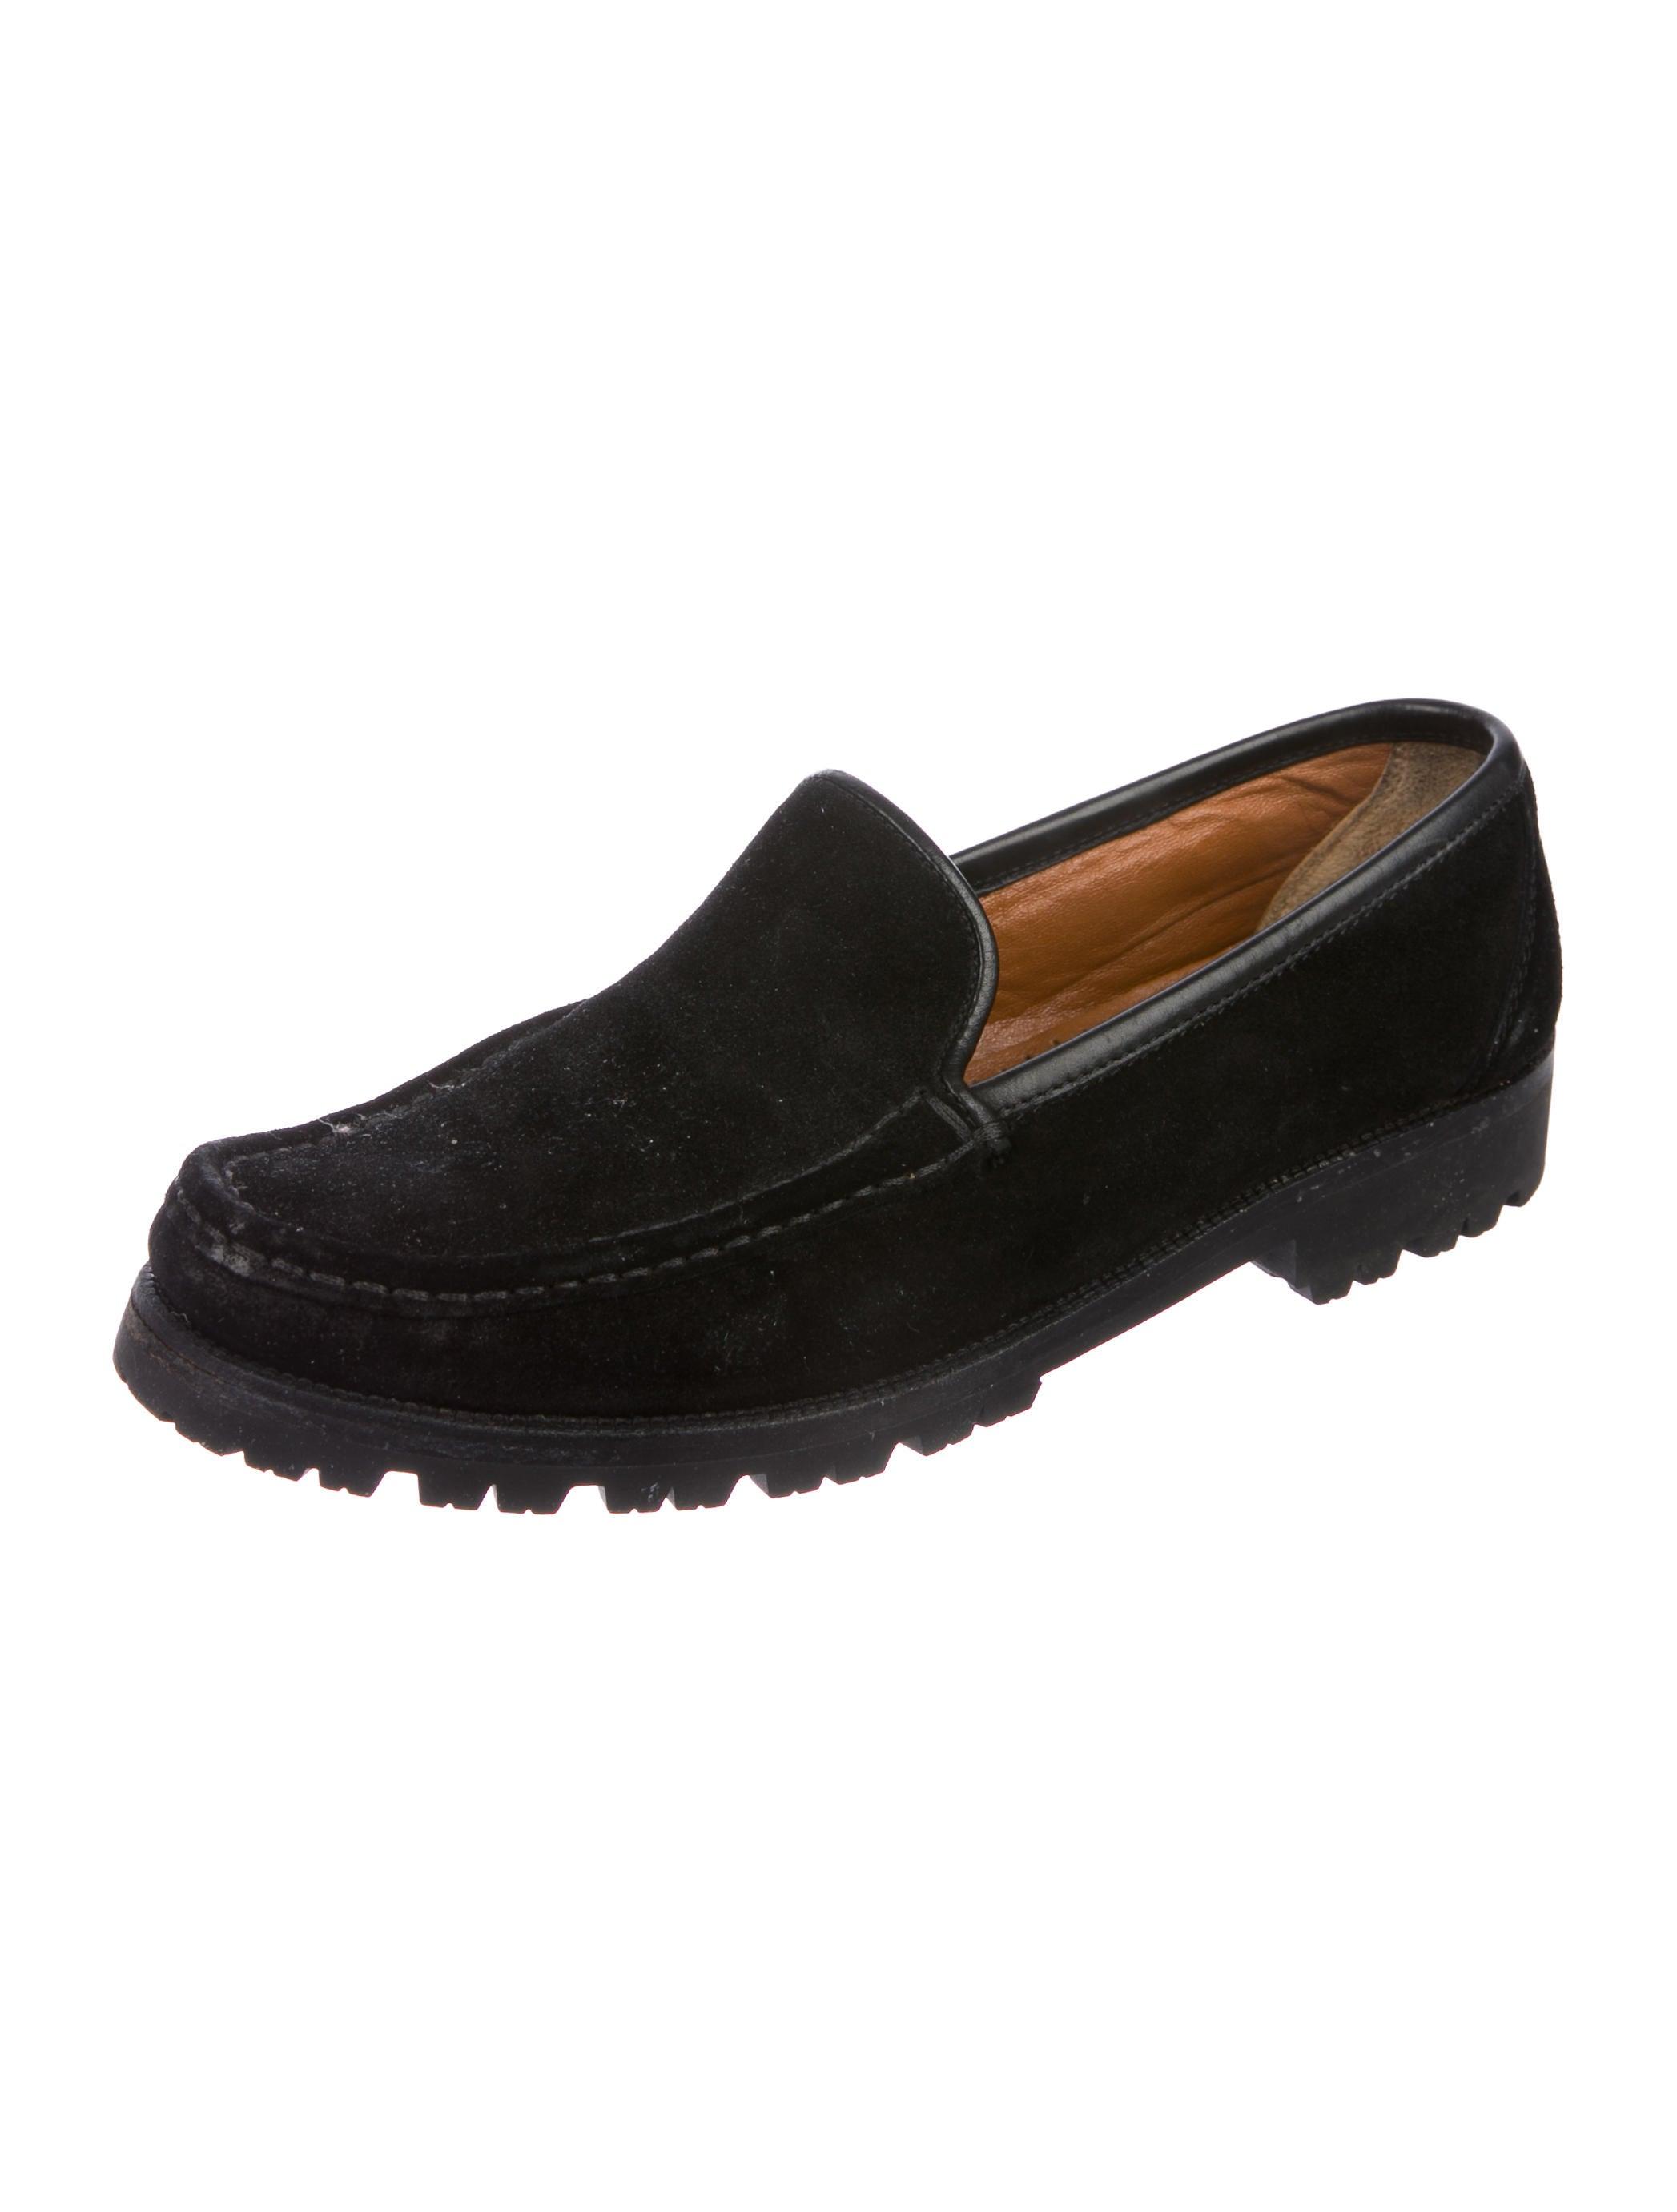 Salvatore Ferragamo Secolo Suede Loafers fake cheap price countdown package cheap price discount wiki ozr2MN